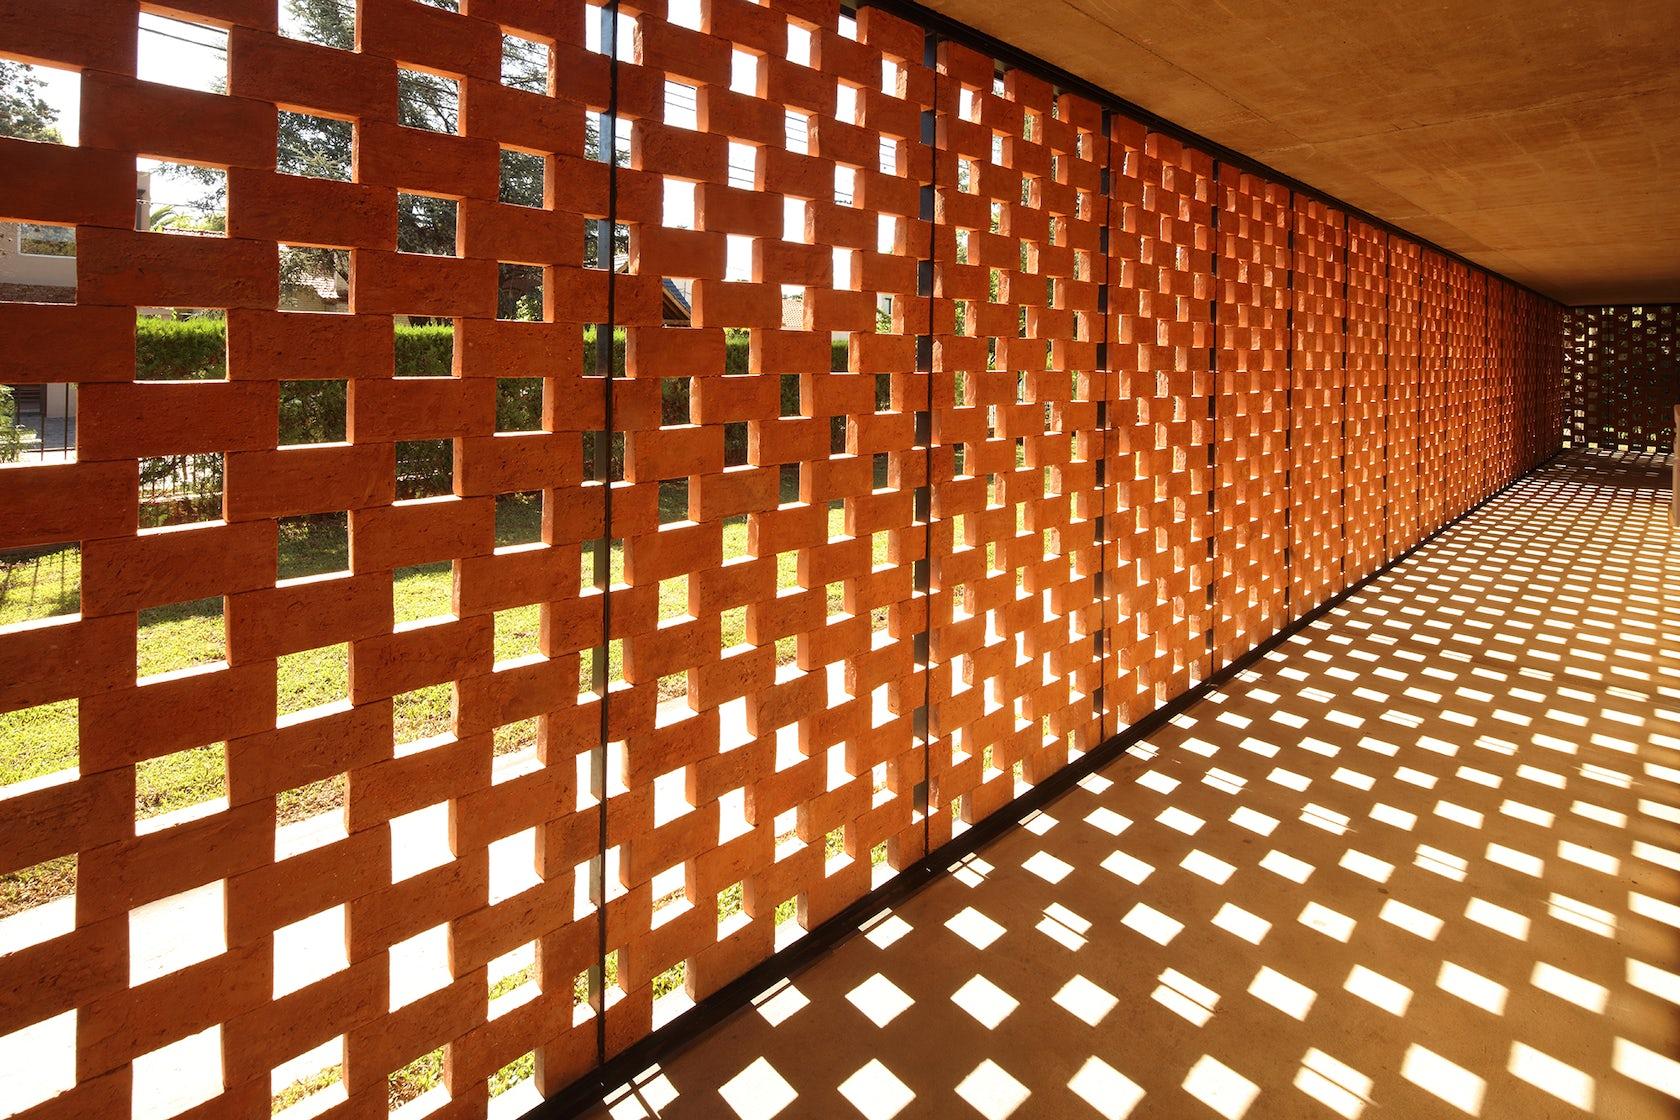 Experimental brick pavilion architizer - Casas de ladrillo visto ...